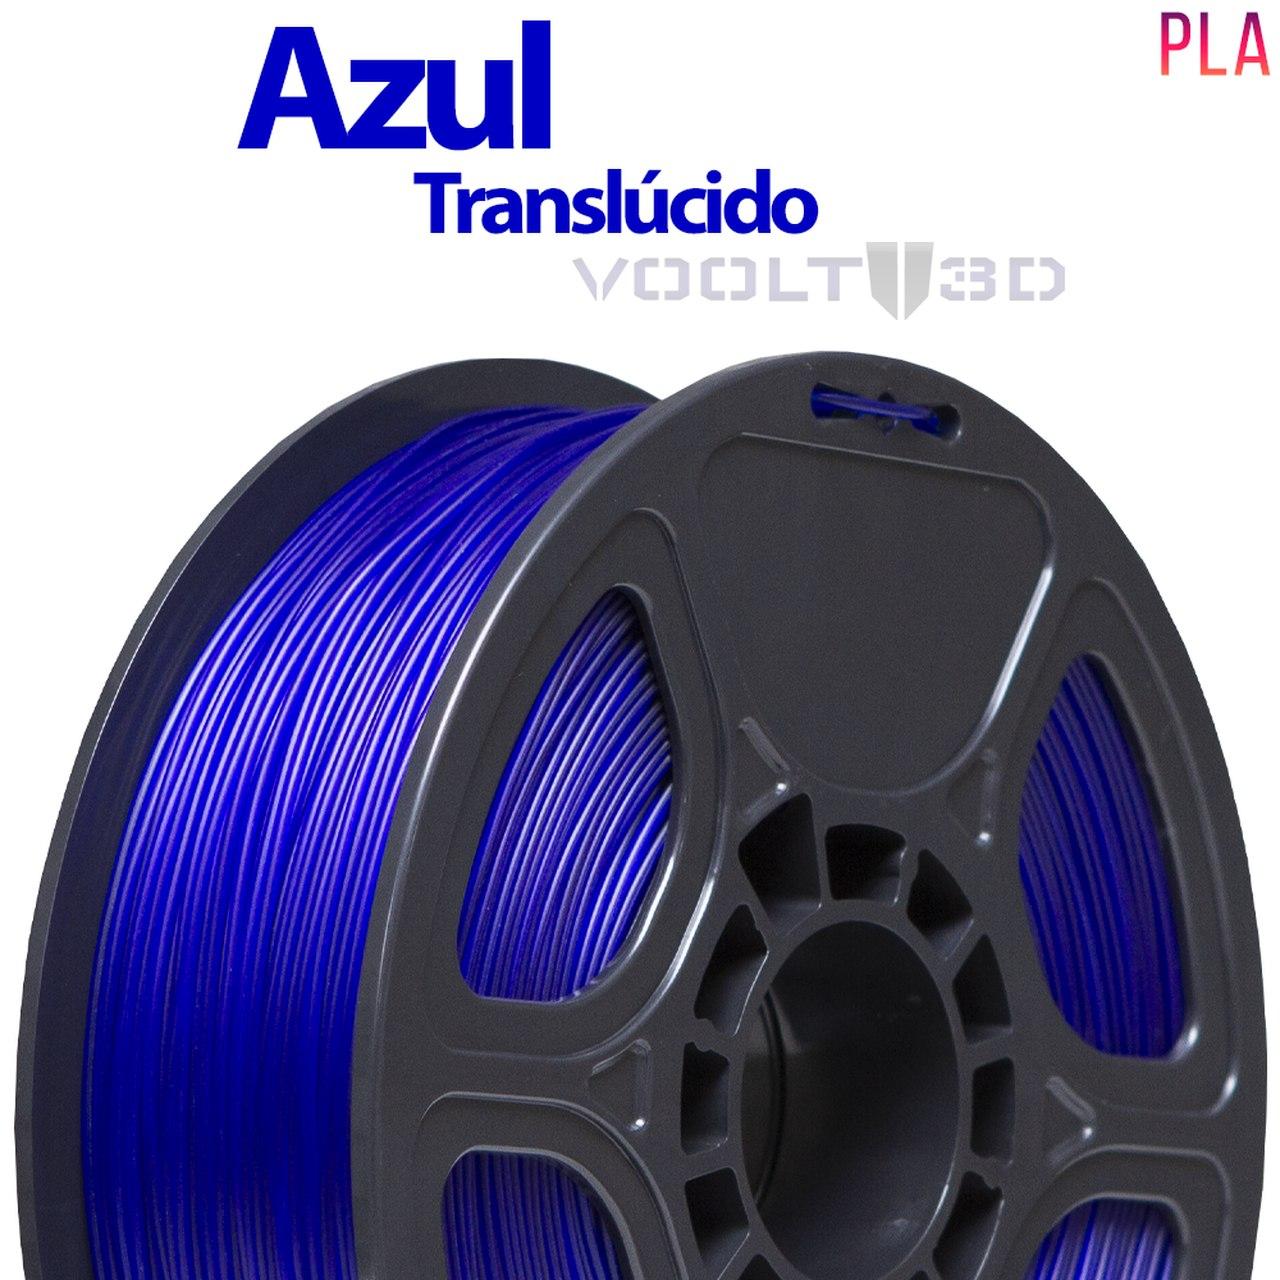 Filamento PLA - Azul Translúcido - Voolt - 1.75mm - 1kg